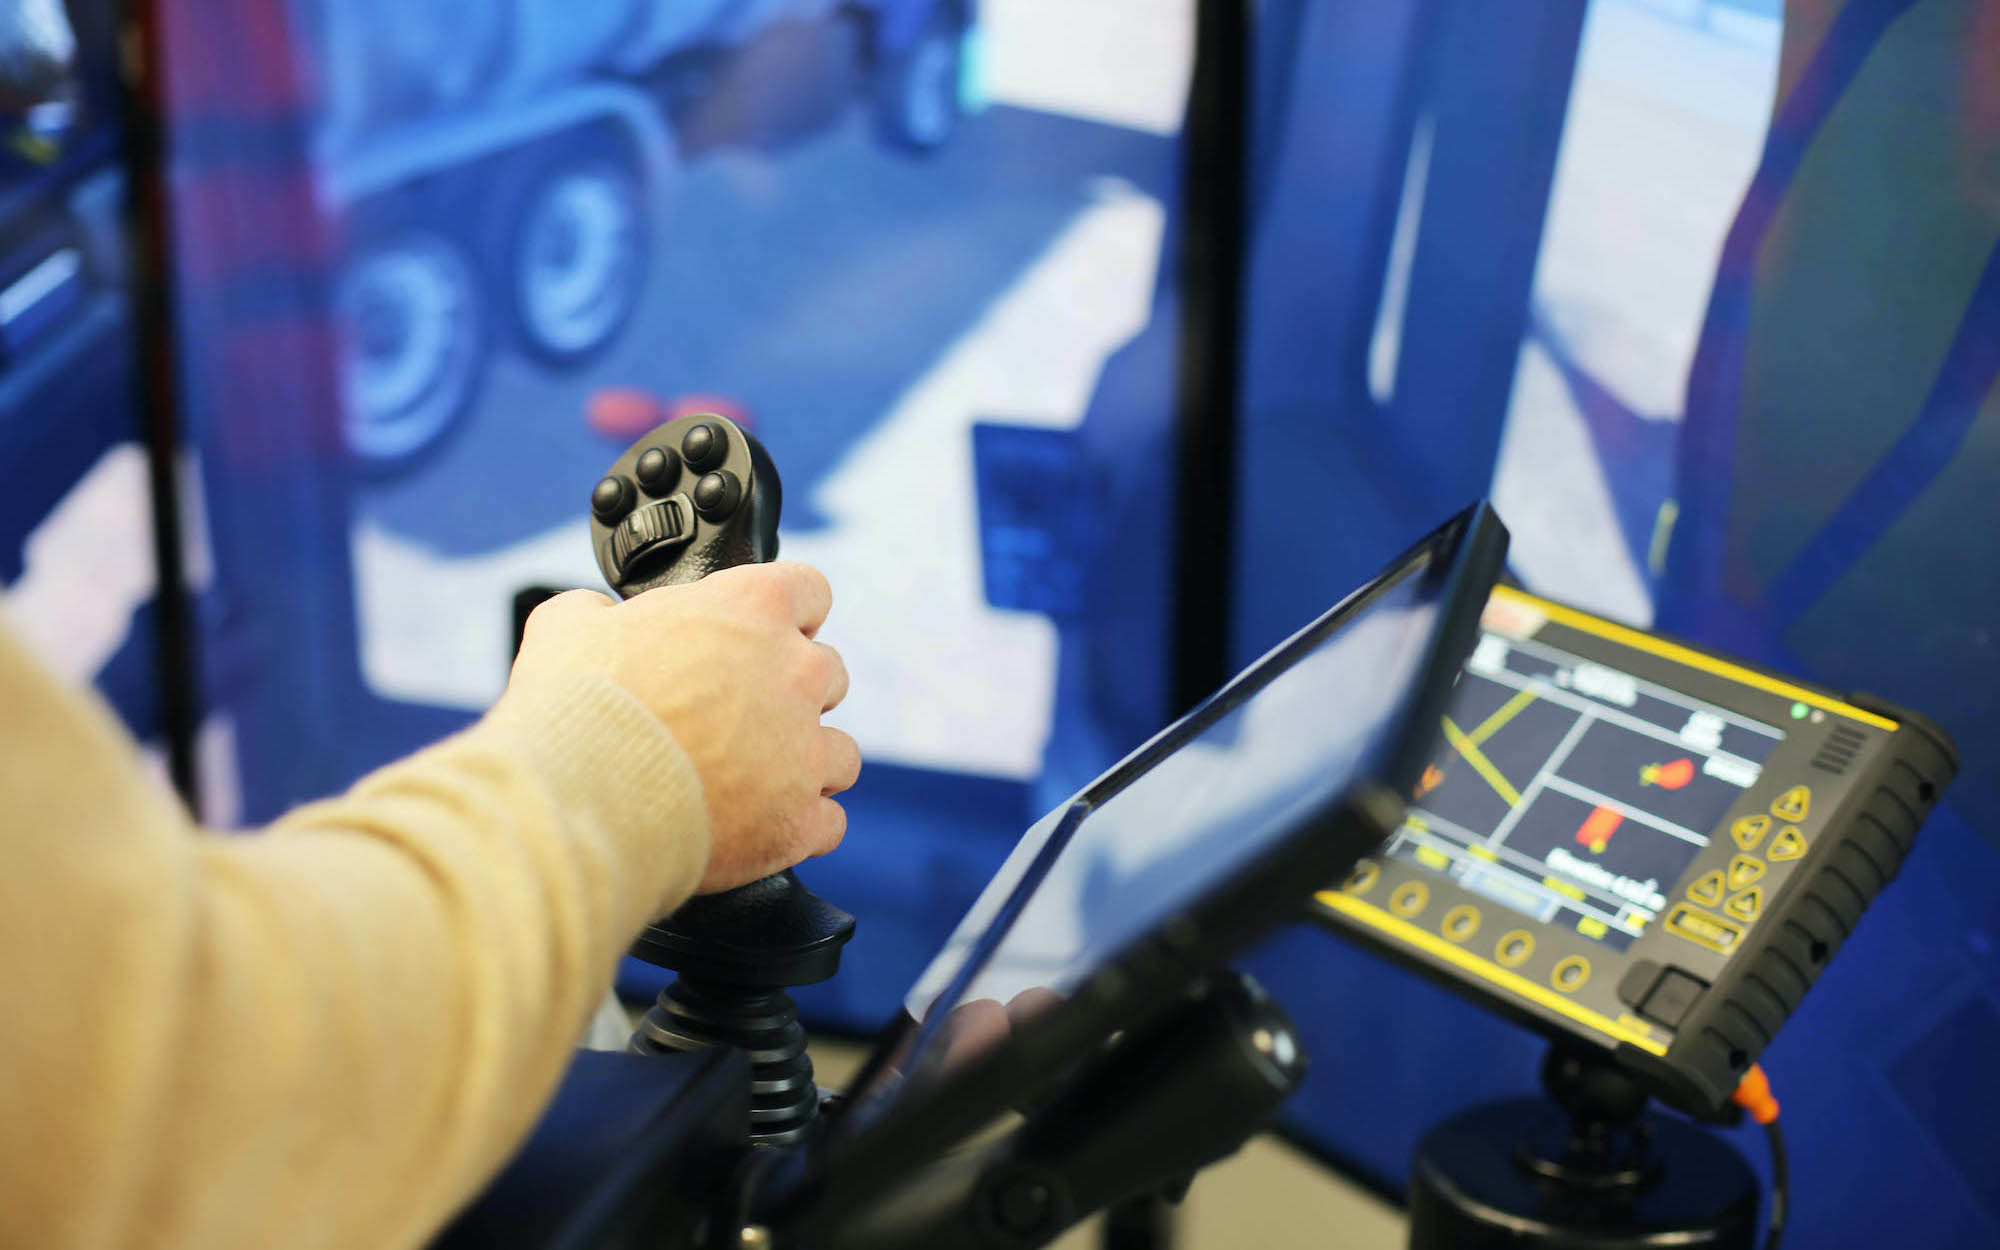 Simulator Close Up One web